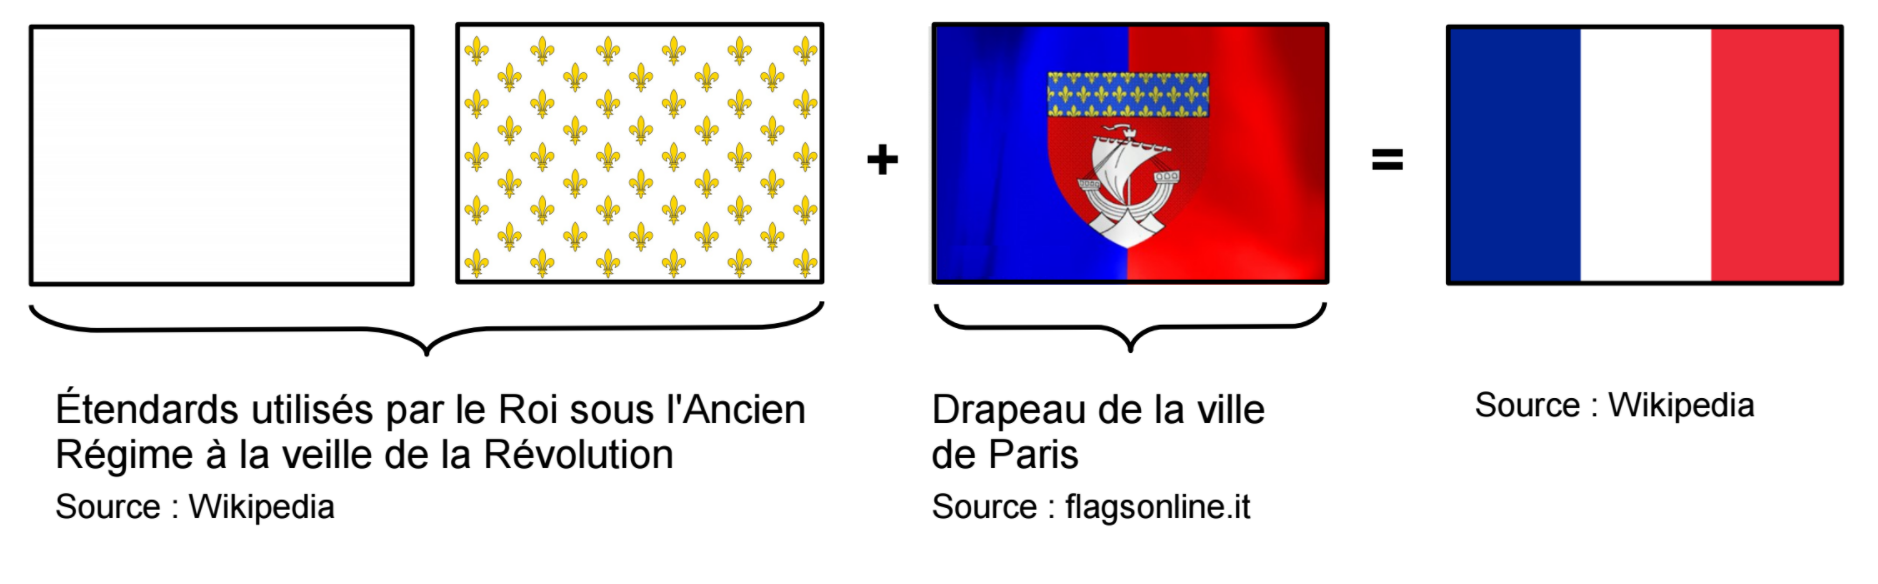 explication drapeau francais